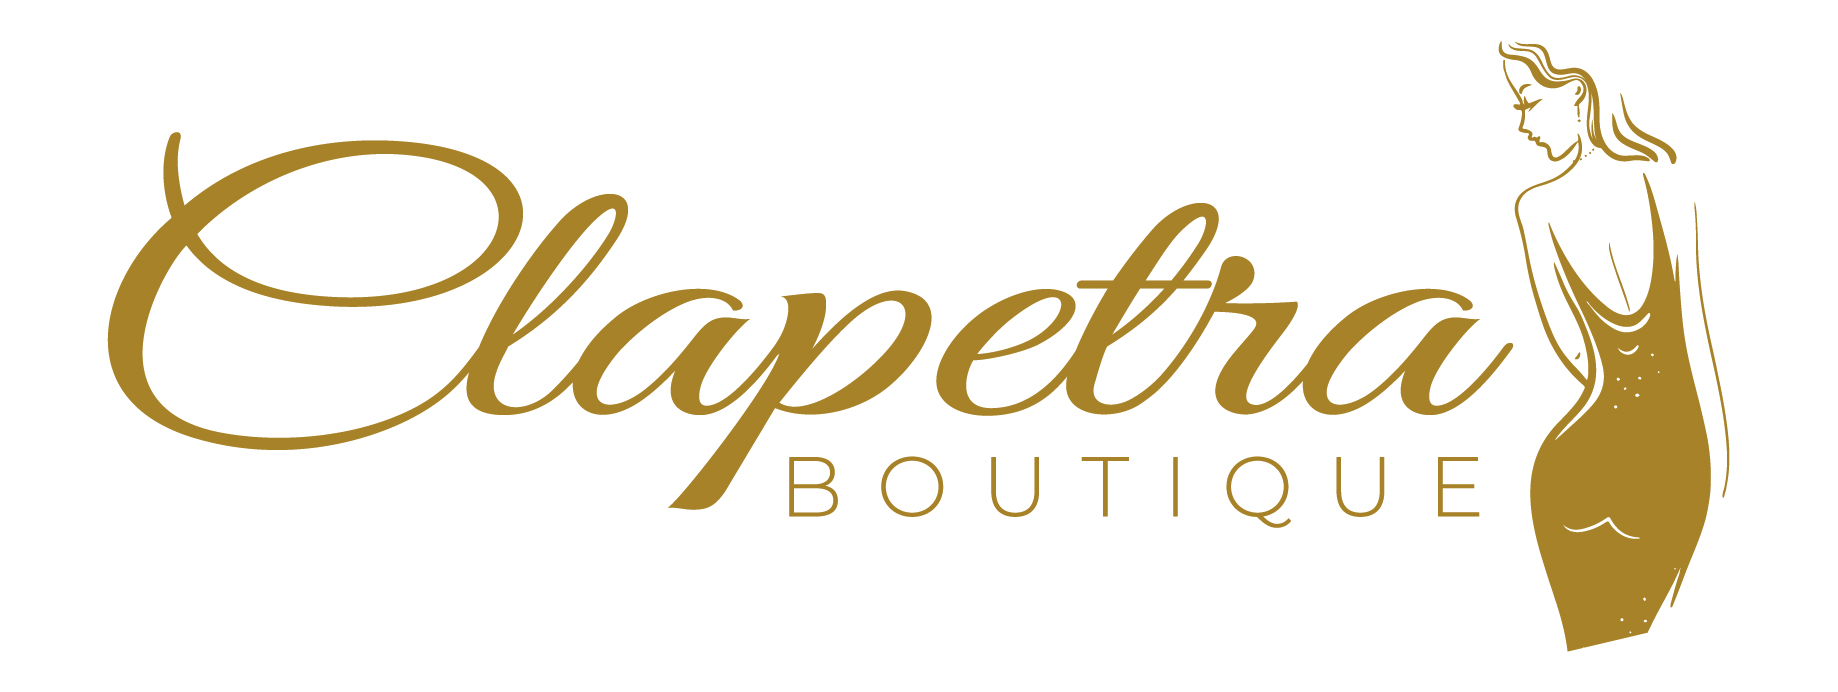 Clapetra Modern Online Boutique Logo